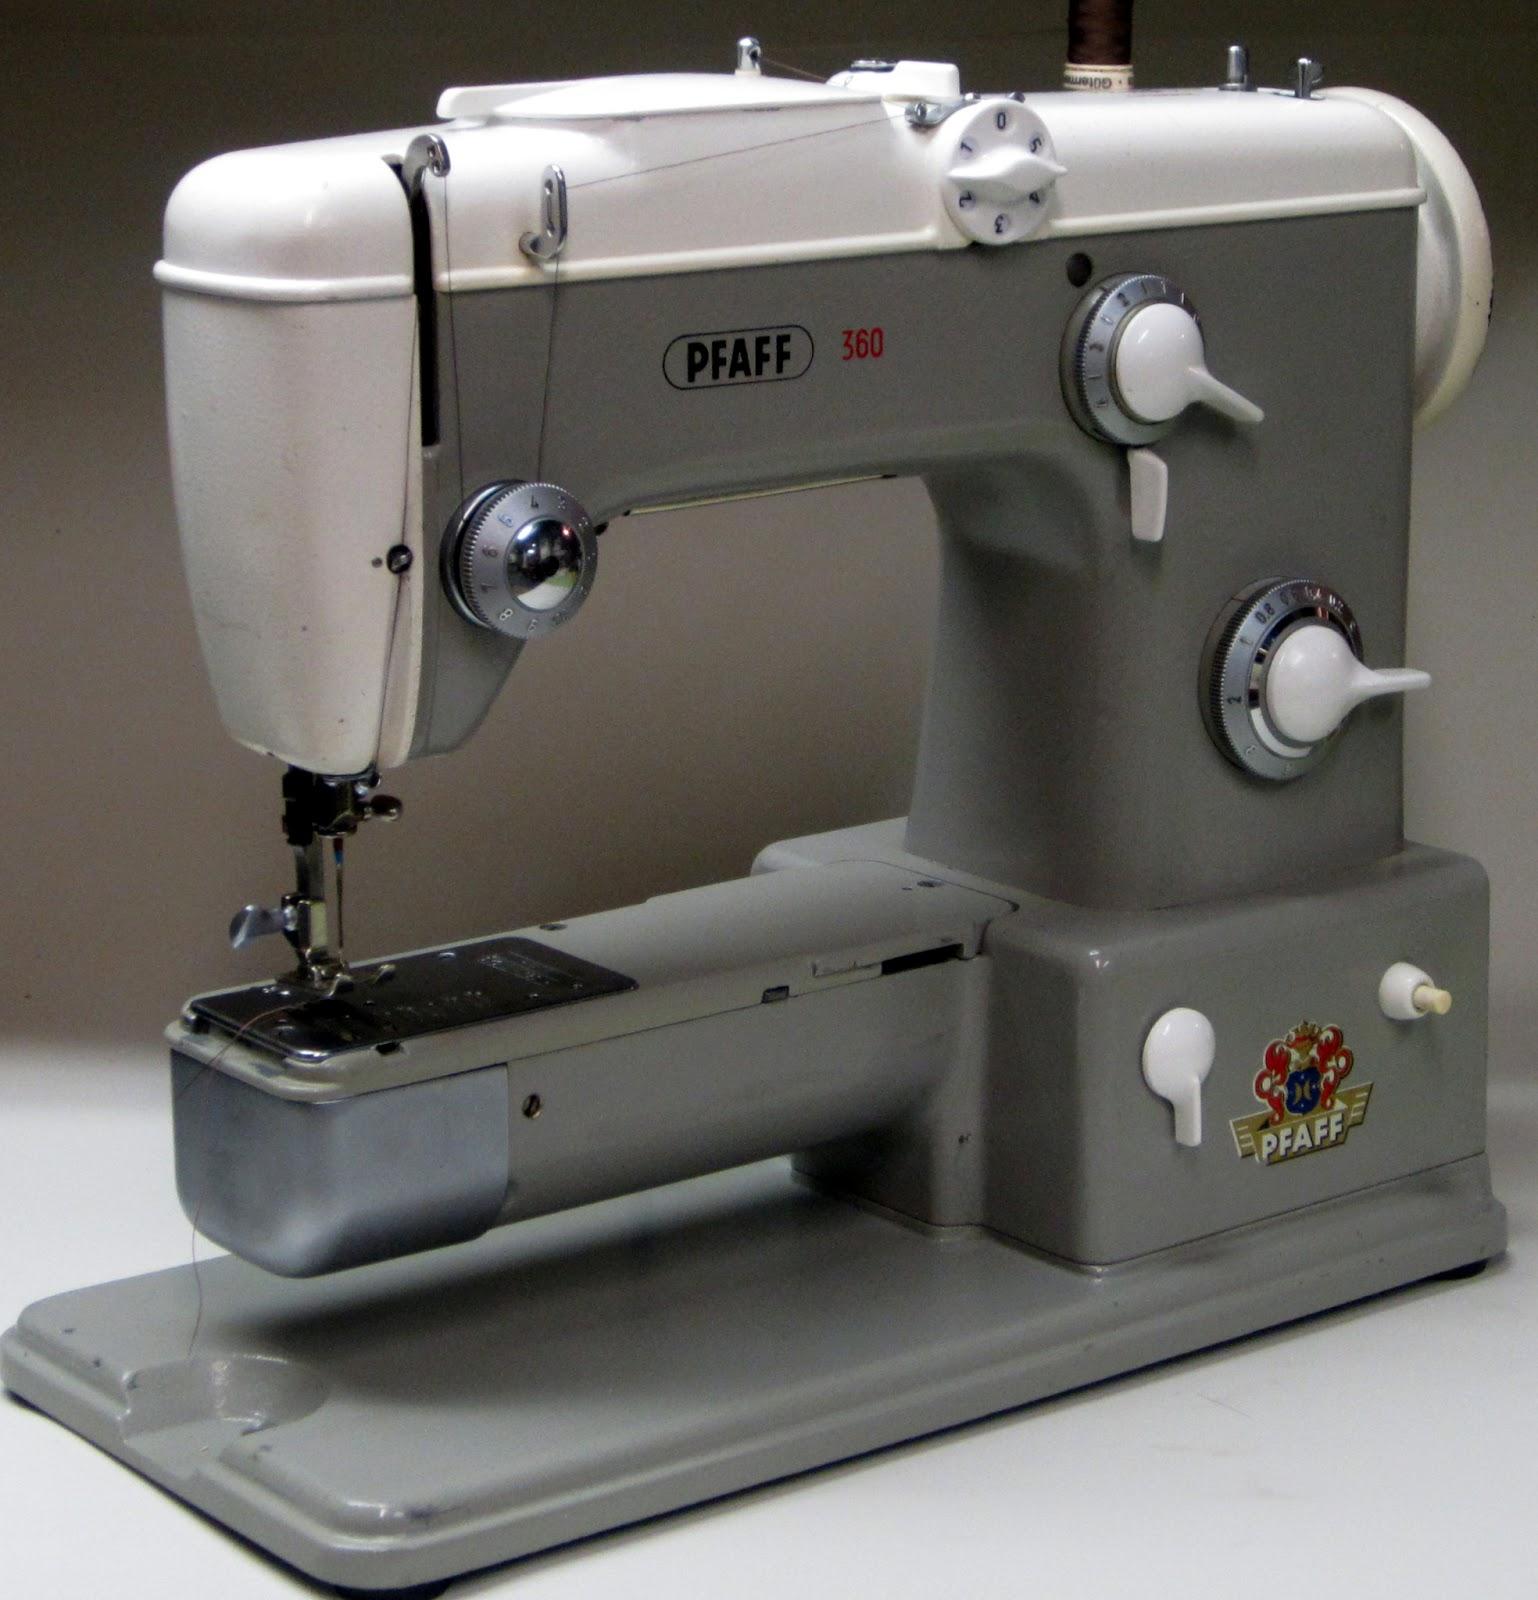 mi vintage sewing machines pfaff 360 1960. Black Bedroom Furniture Sets. Home Design Ideas